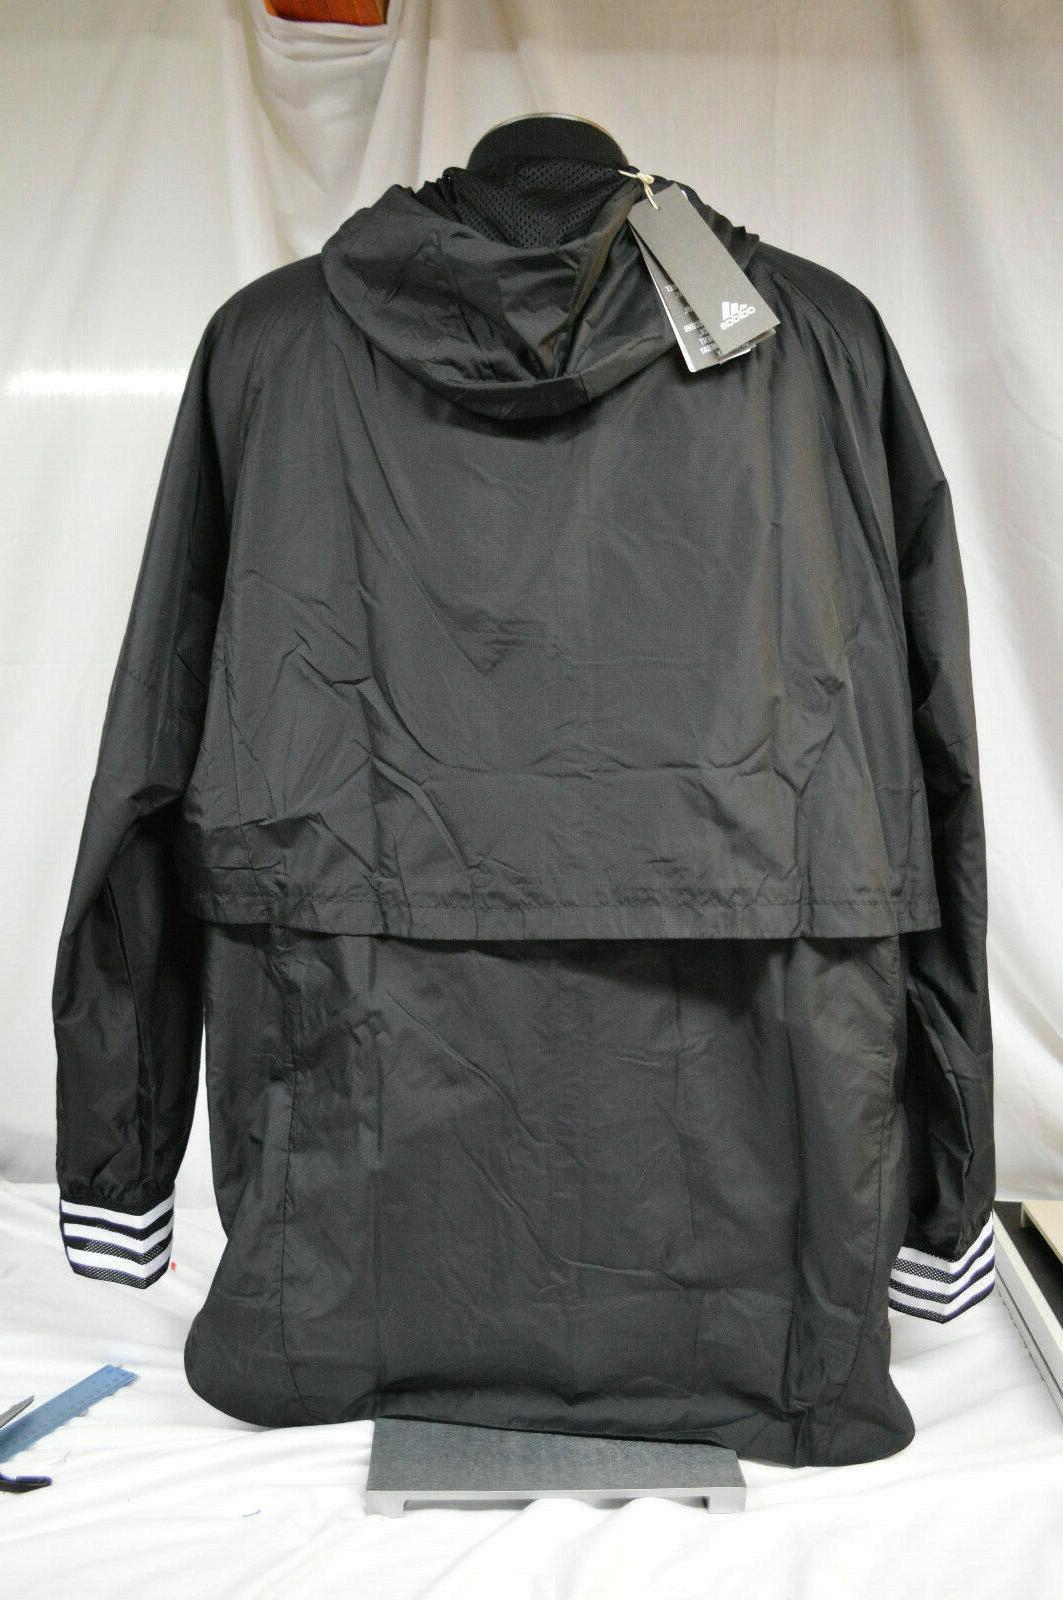 Adidas Men's Hooded Windbreaker Reflective Jacket